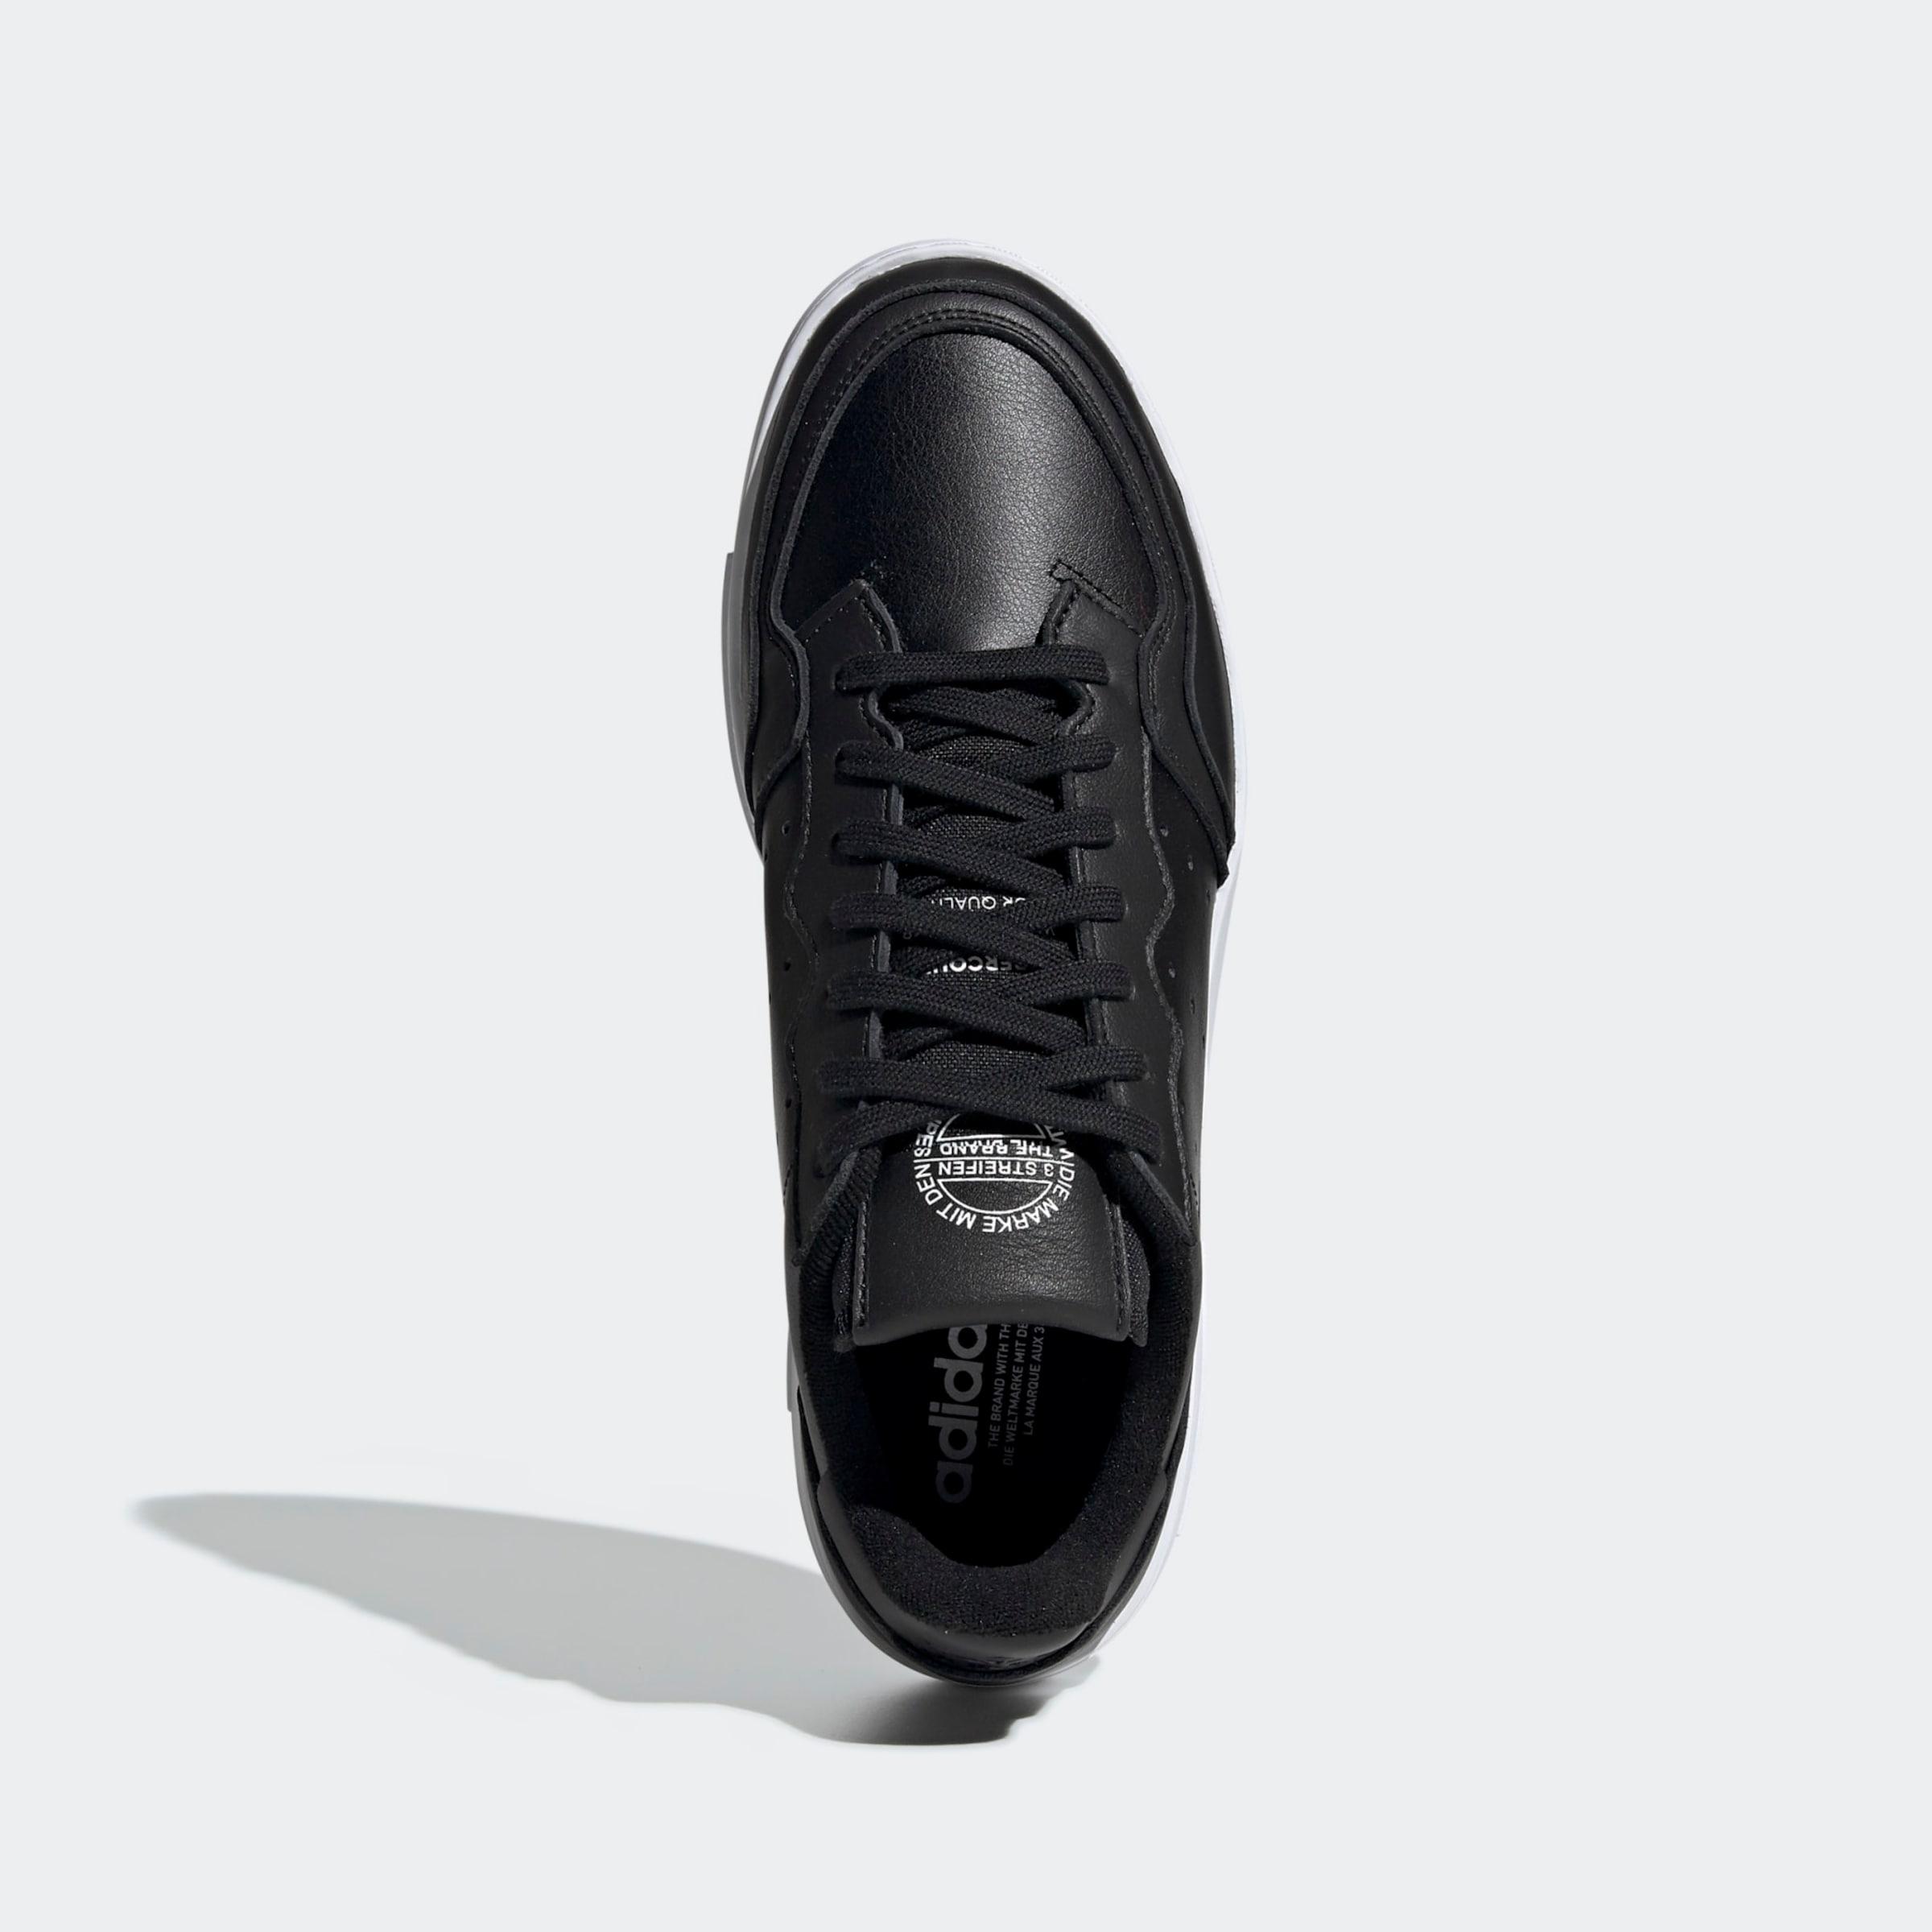 ADIDAS ORIGINALS Låg sneaker 'Supercourt' i svart